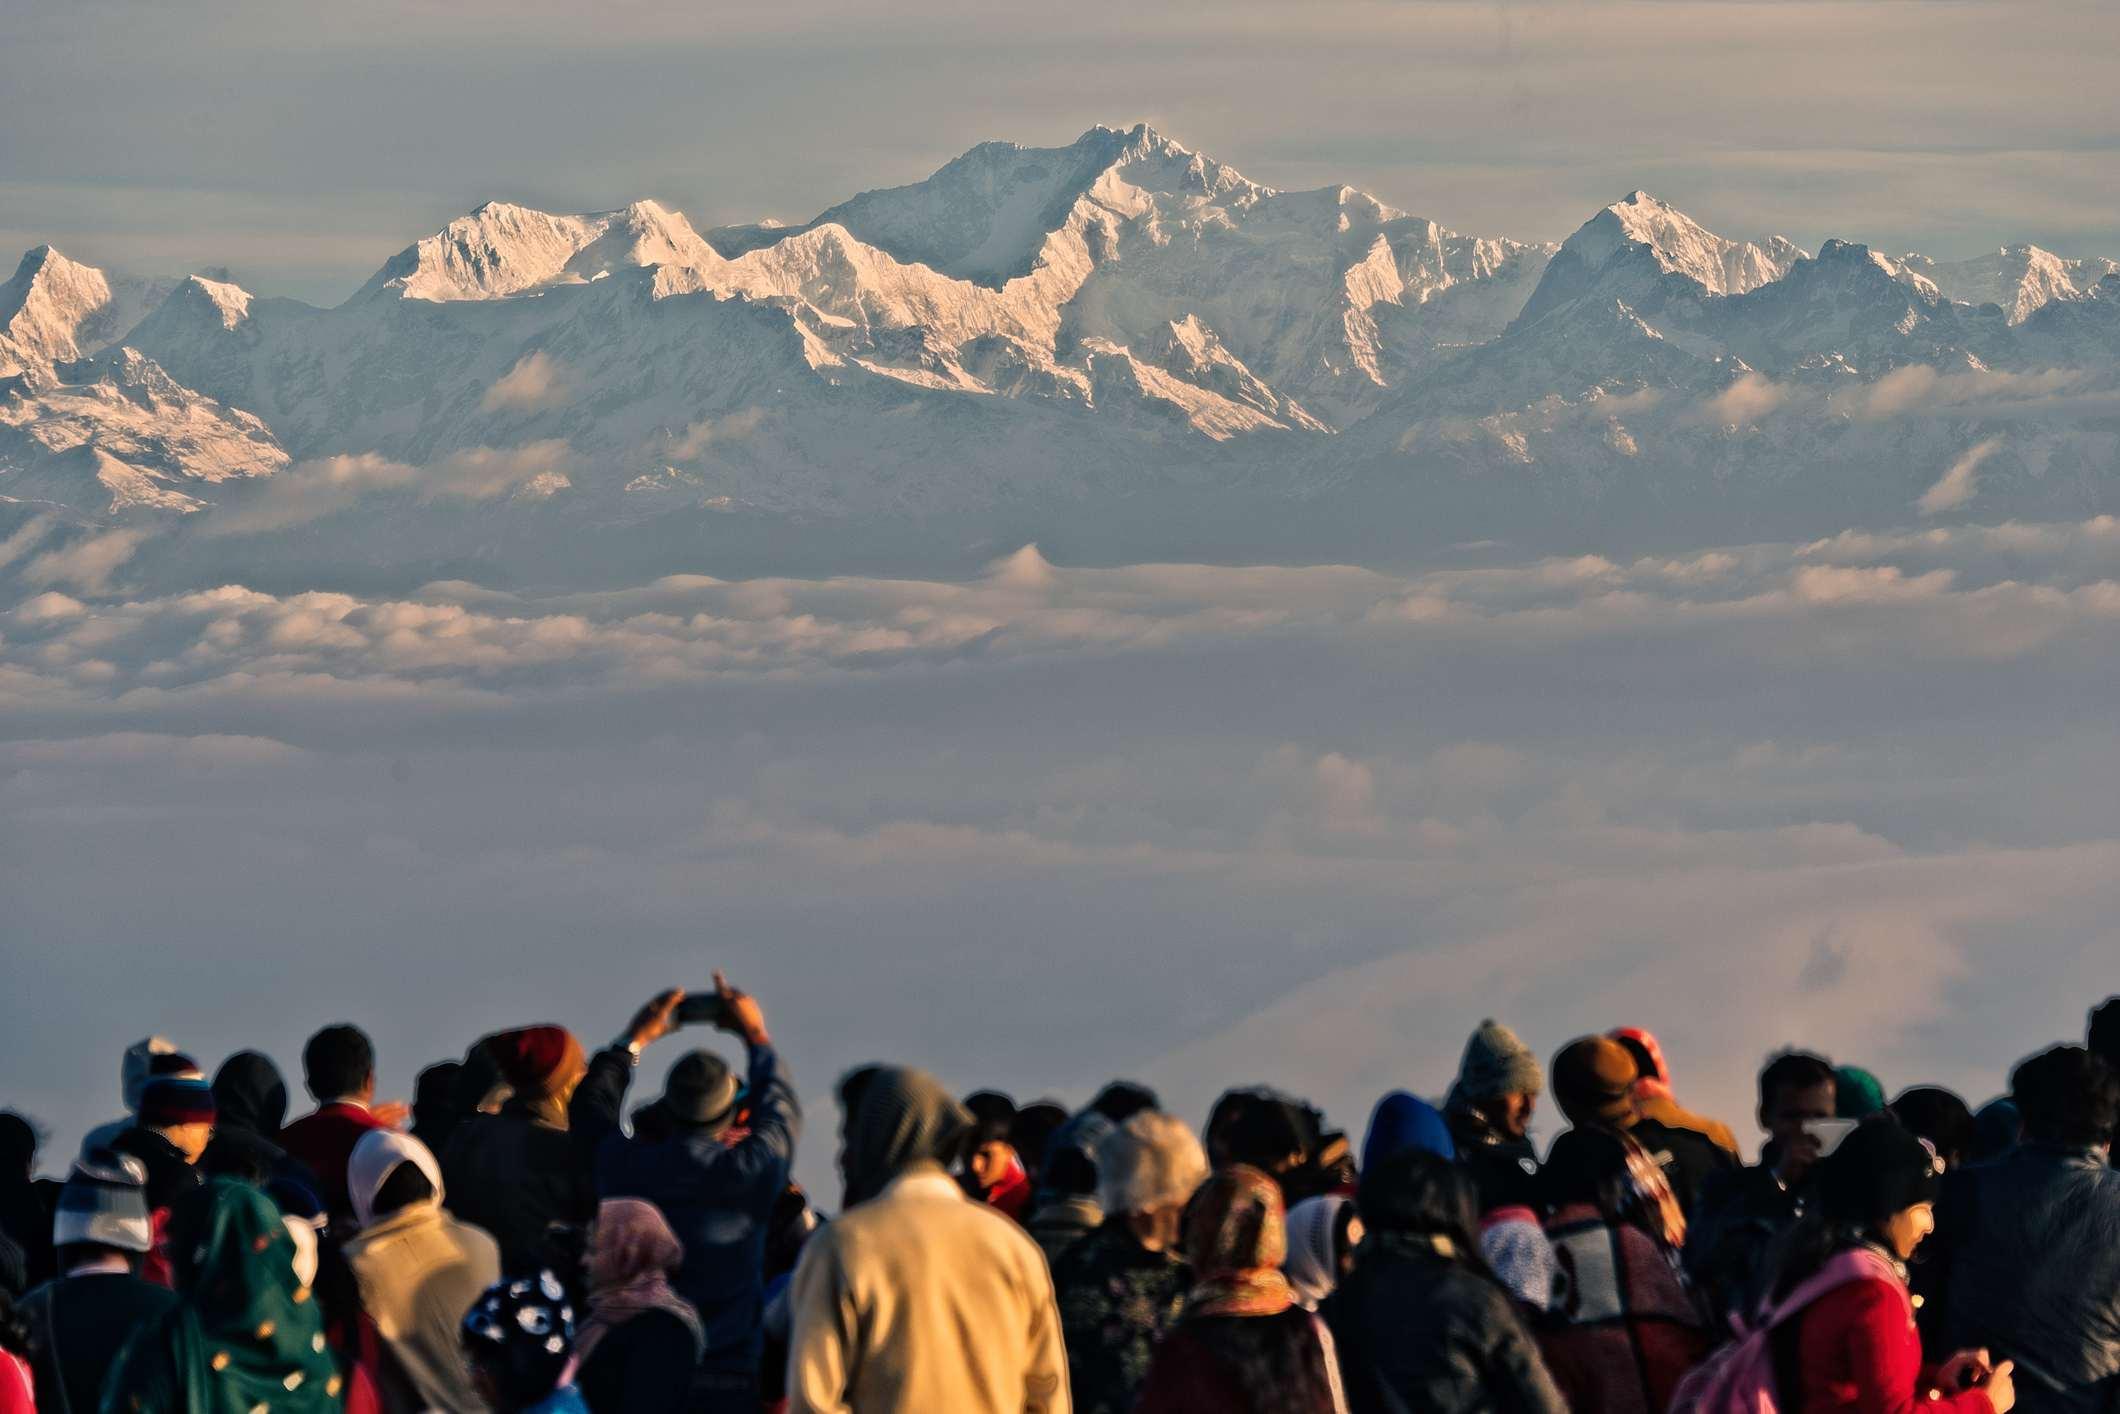 Watching sunrise over Mount Kanchenjunga.